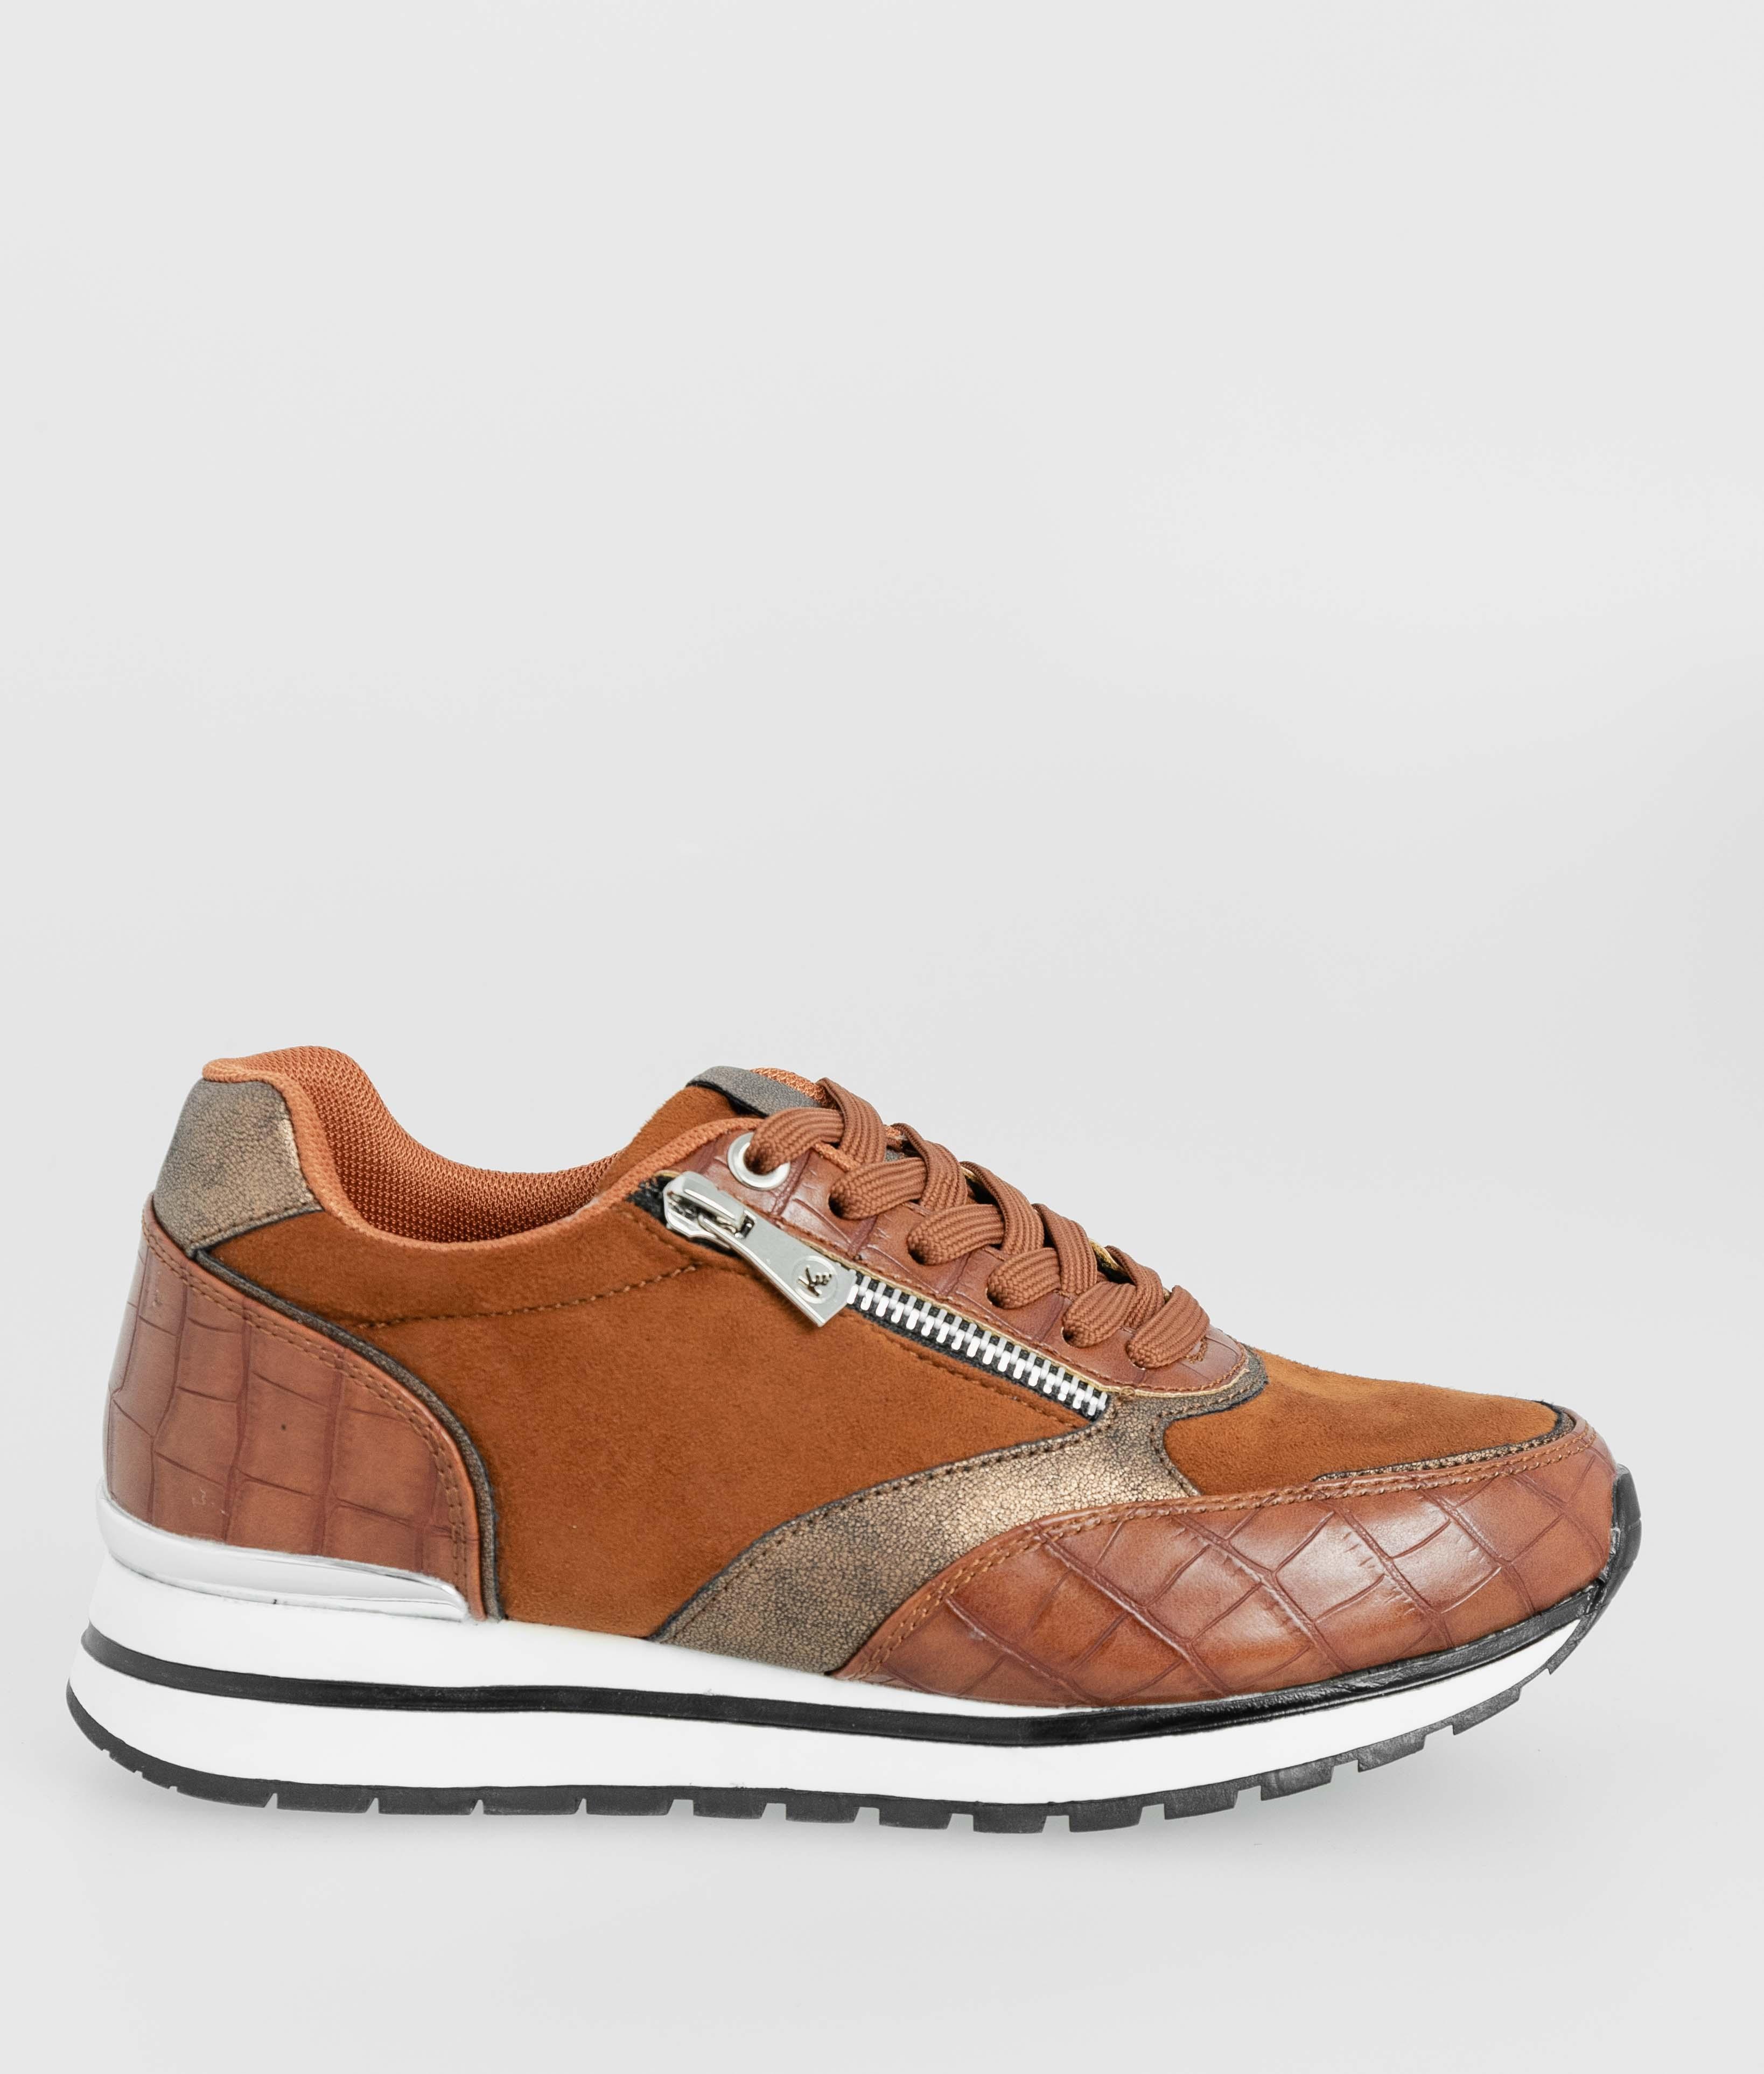 Sneakers Amel - Cammello